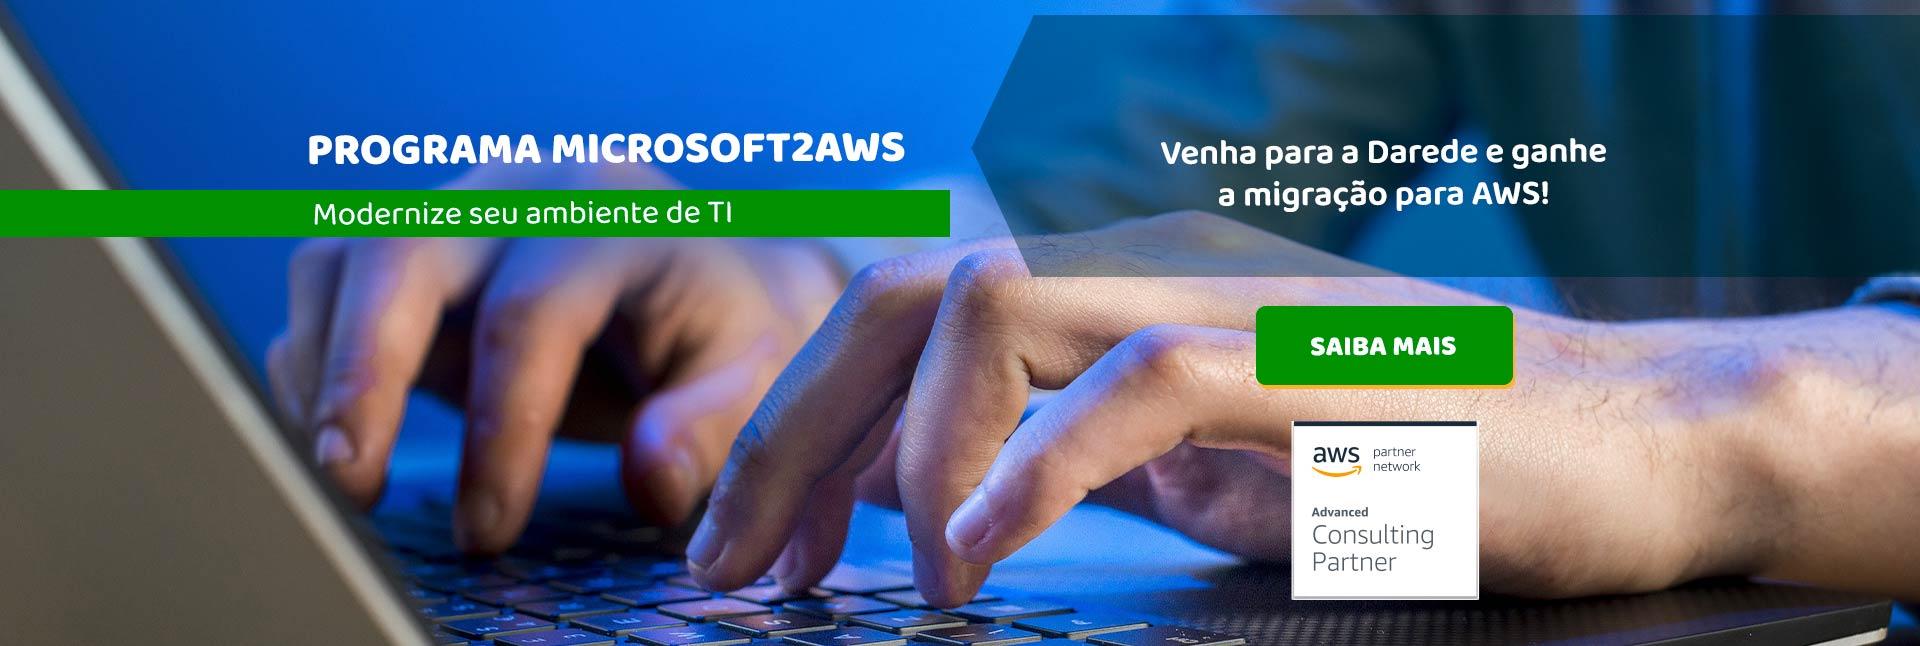 Microsoft2AWS